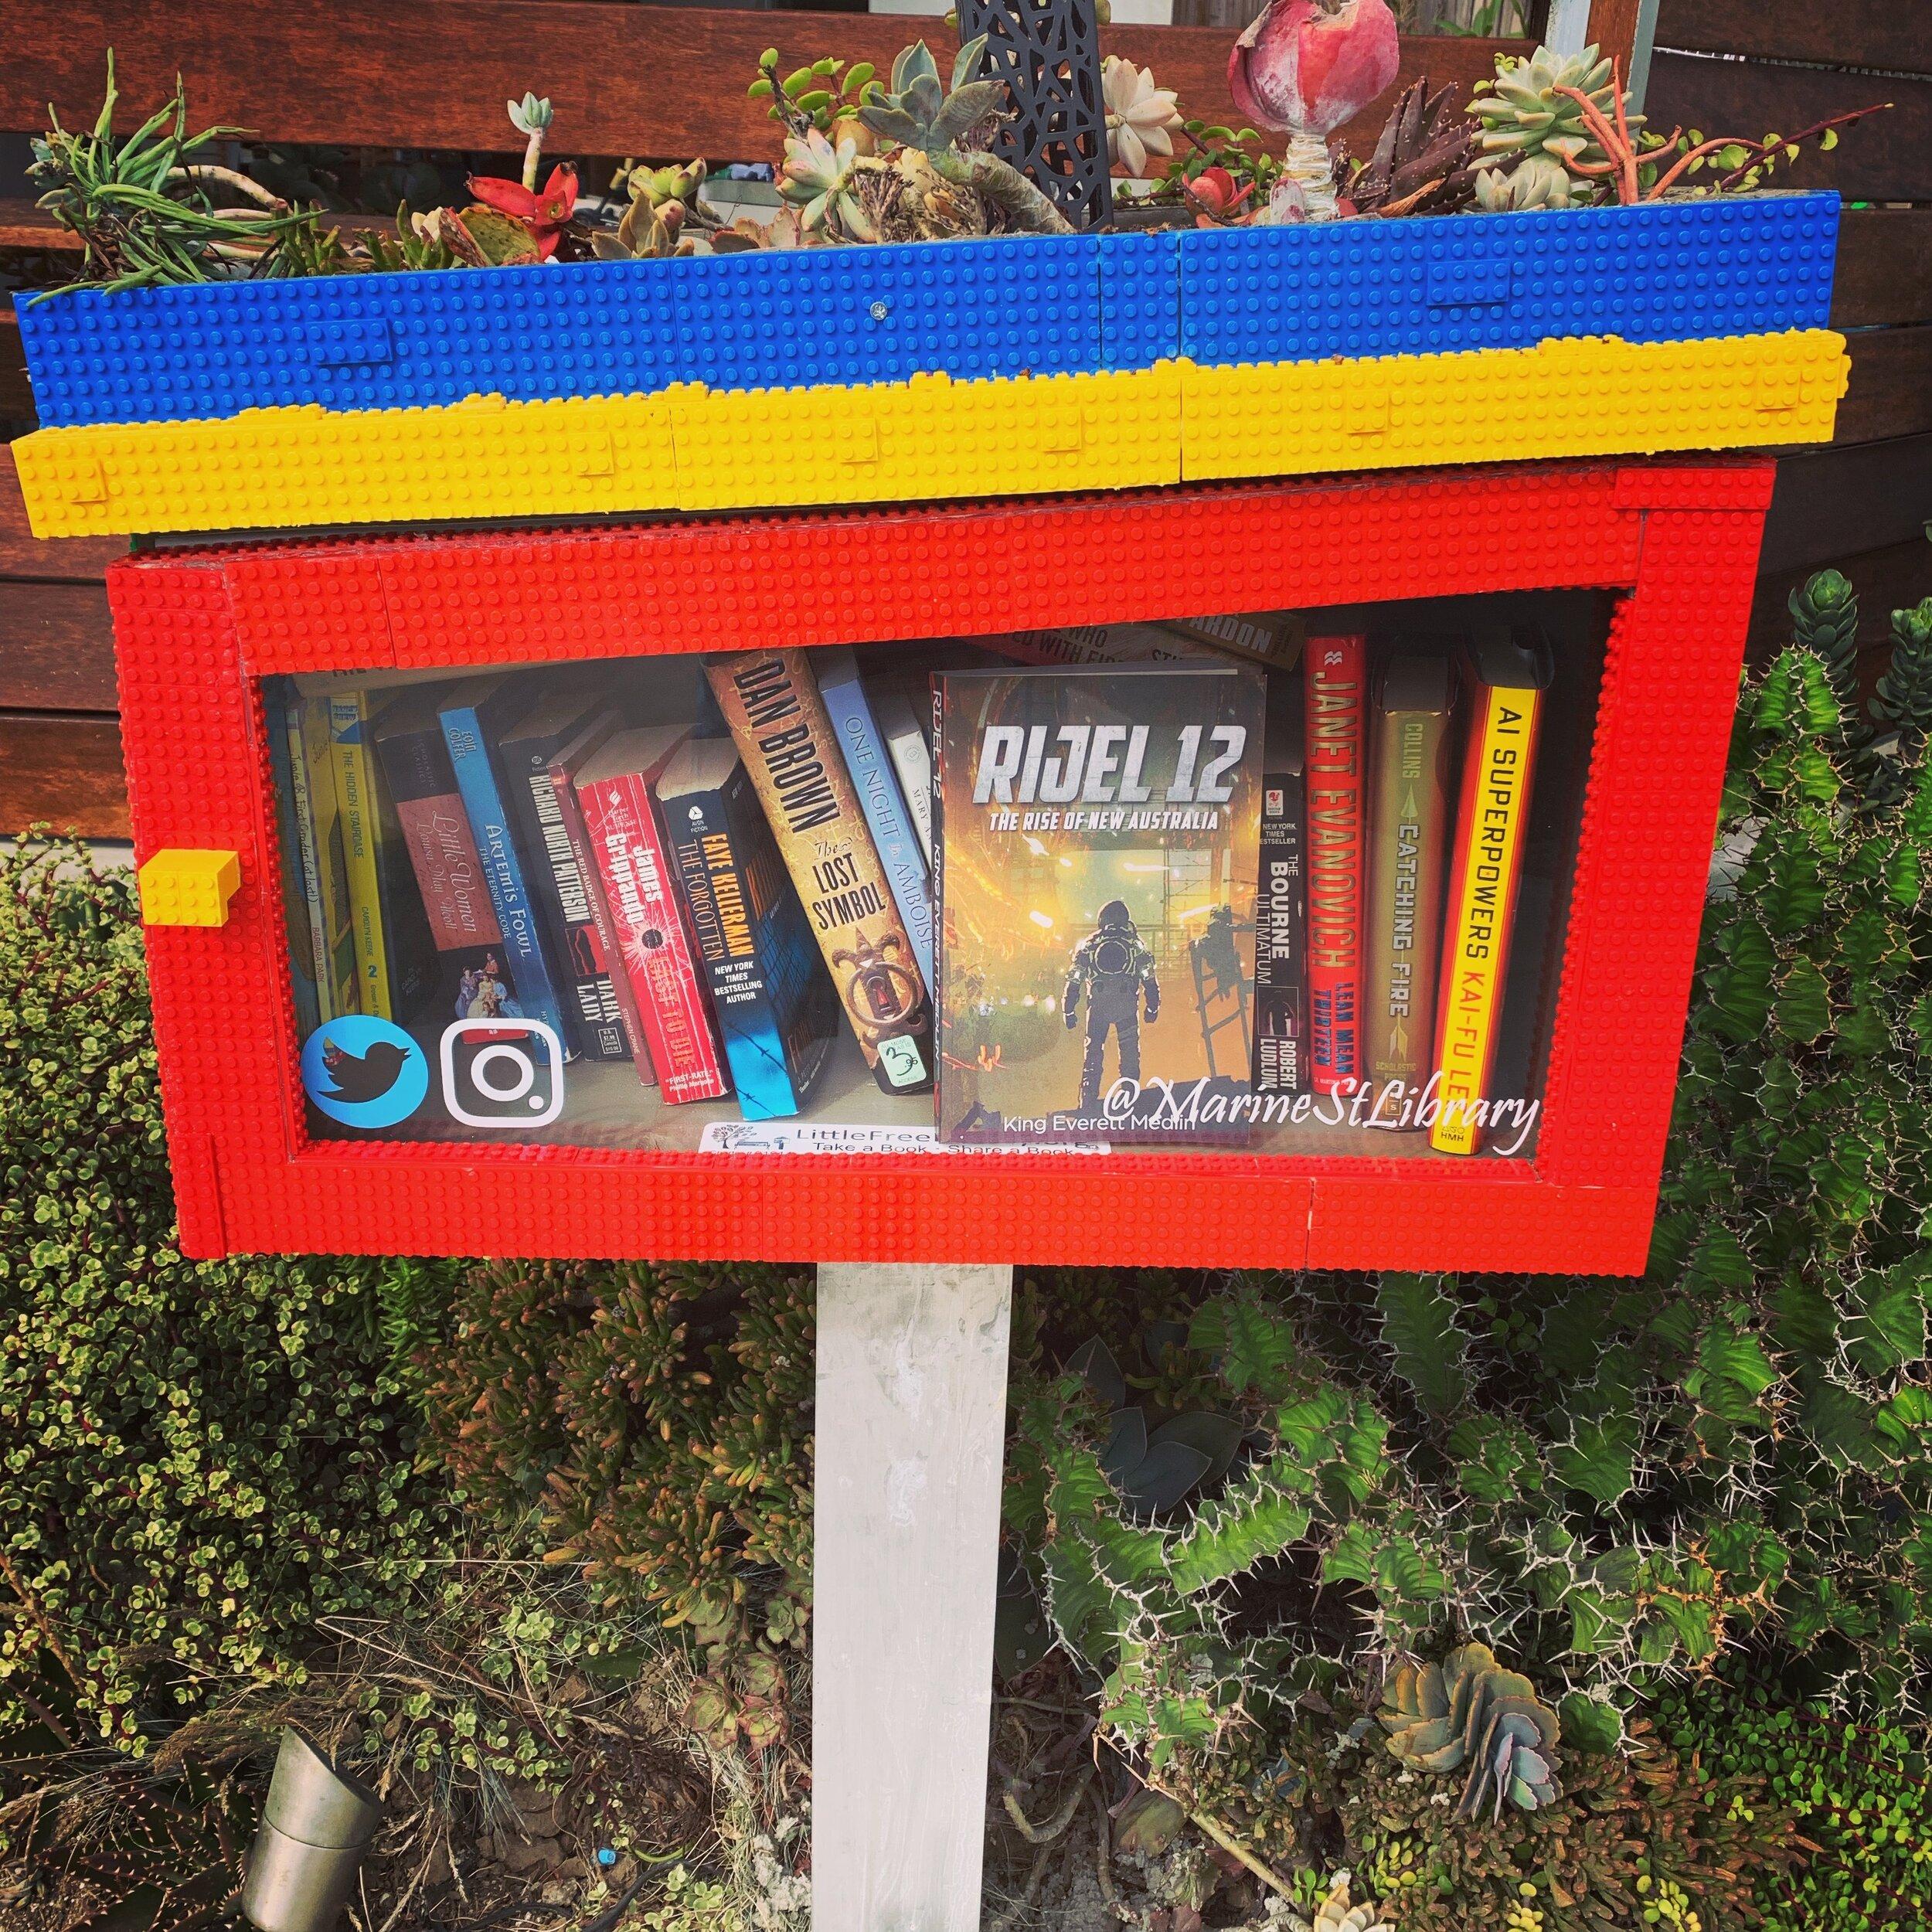 Rijel 12 in a LEGO little free library.